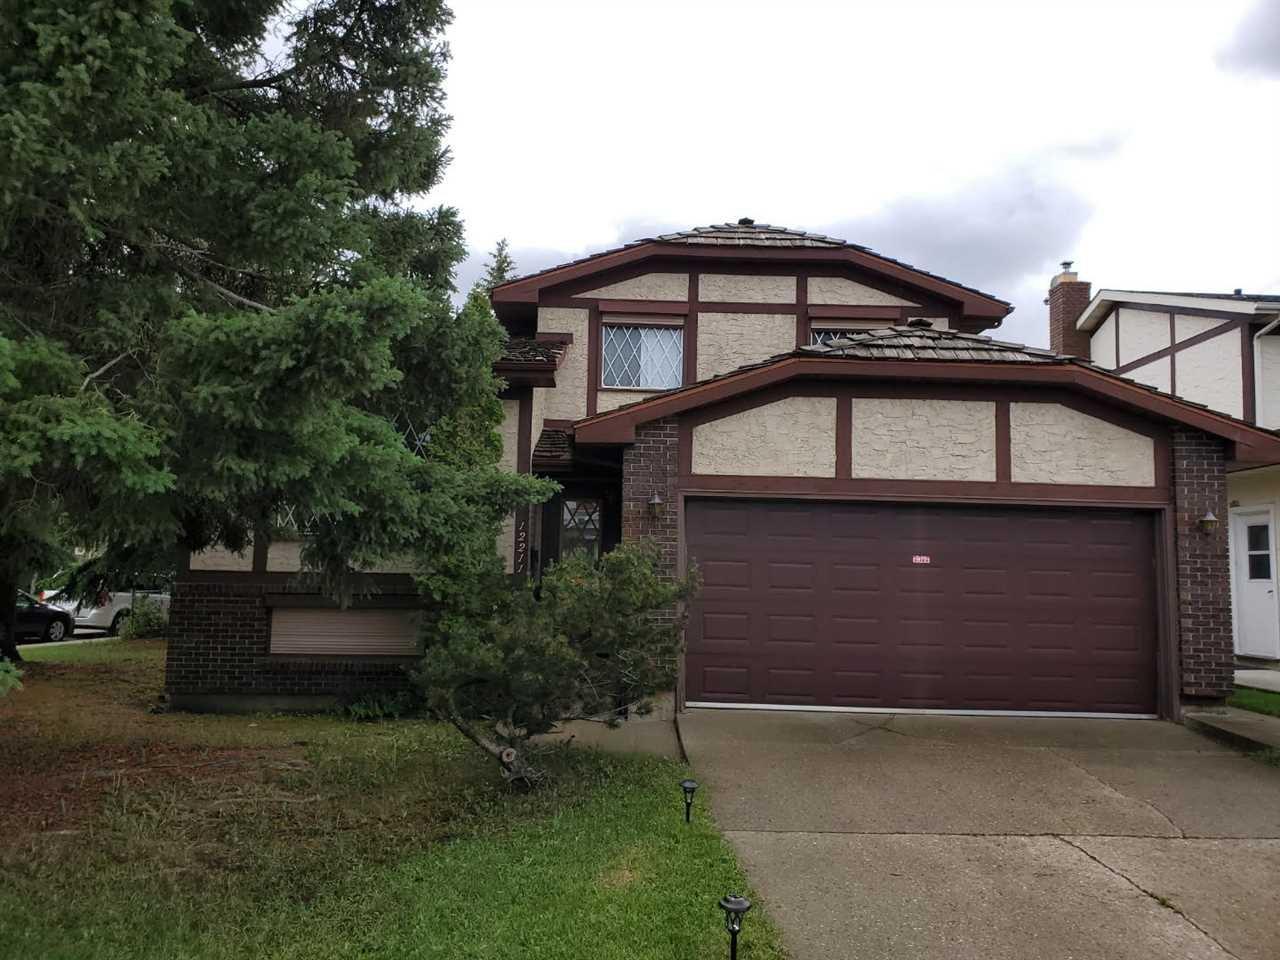 Main Photo: 12211 143 Avenue in Edmonton: Zone 27 House for sale : MLS®# E4163858